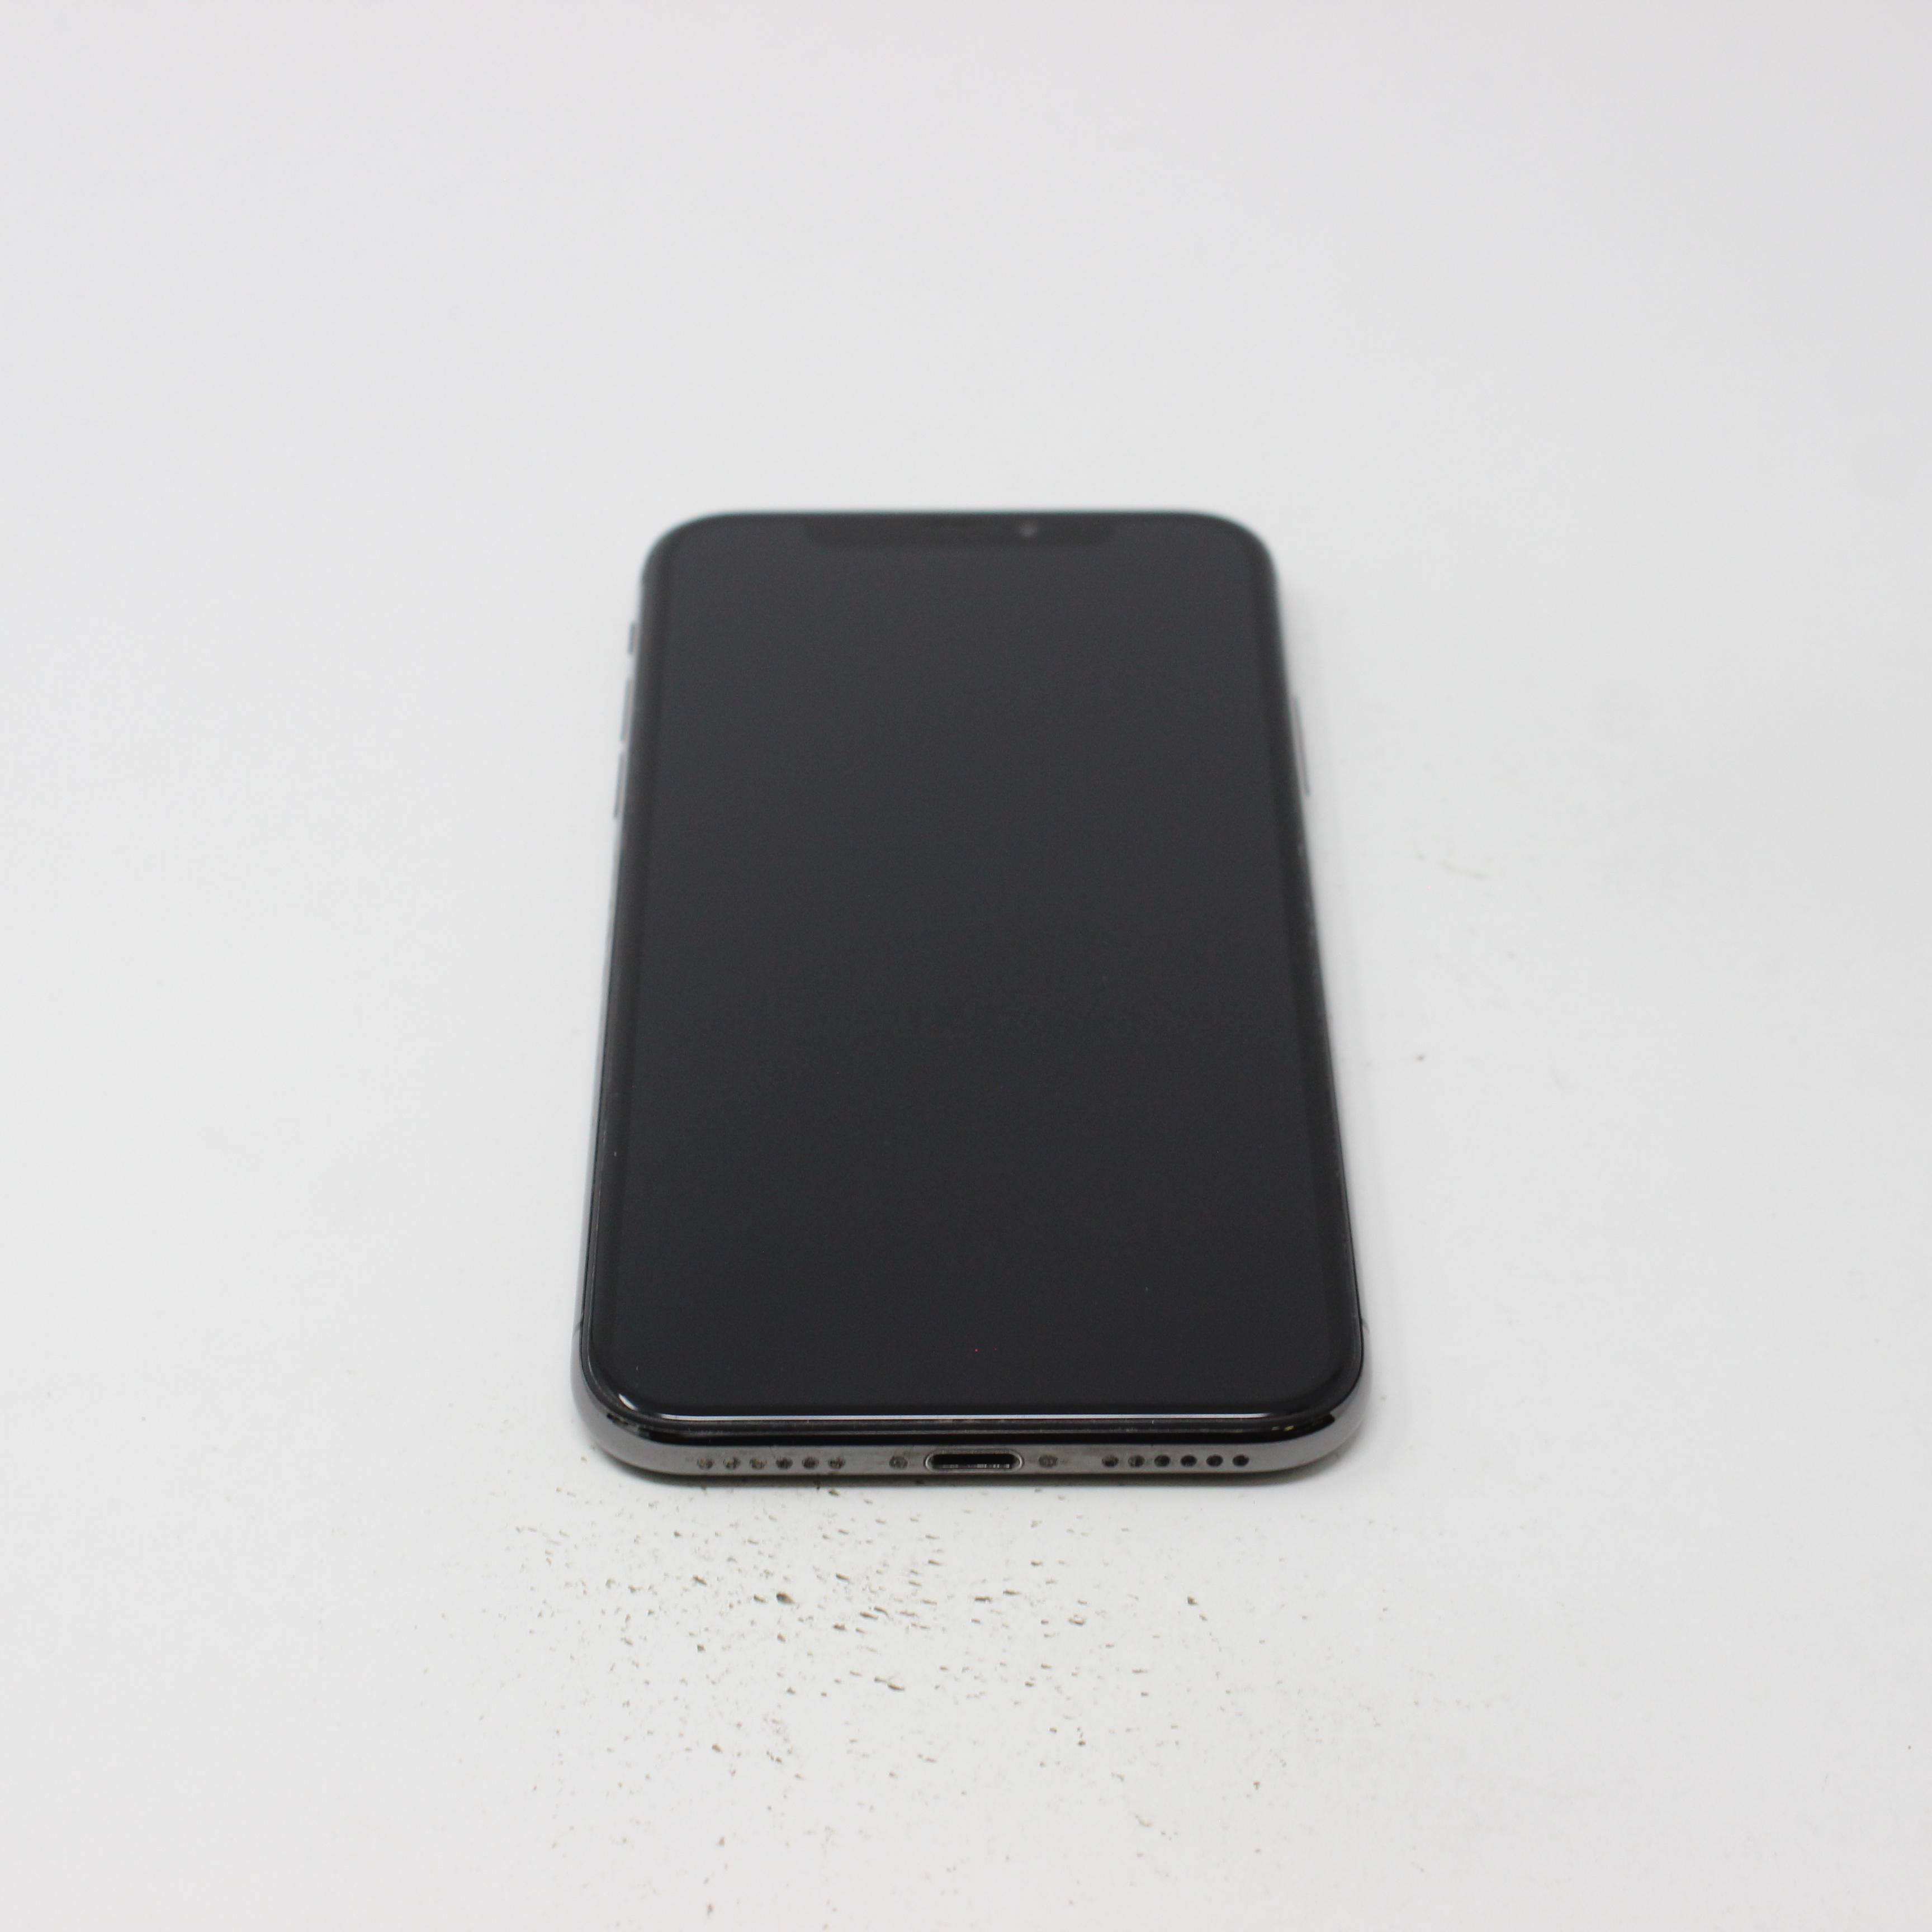 iPhone X 256GB Space Gray - T-Mobile photo 2 | UpTradeit.com